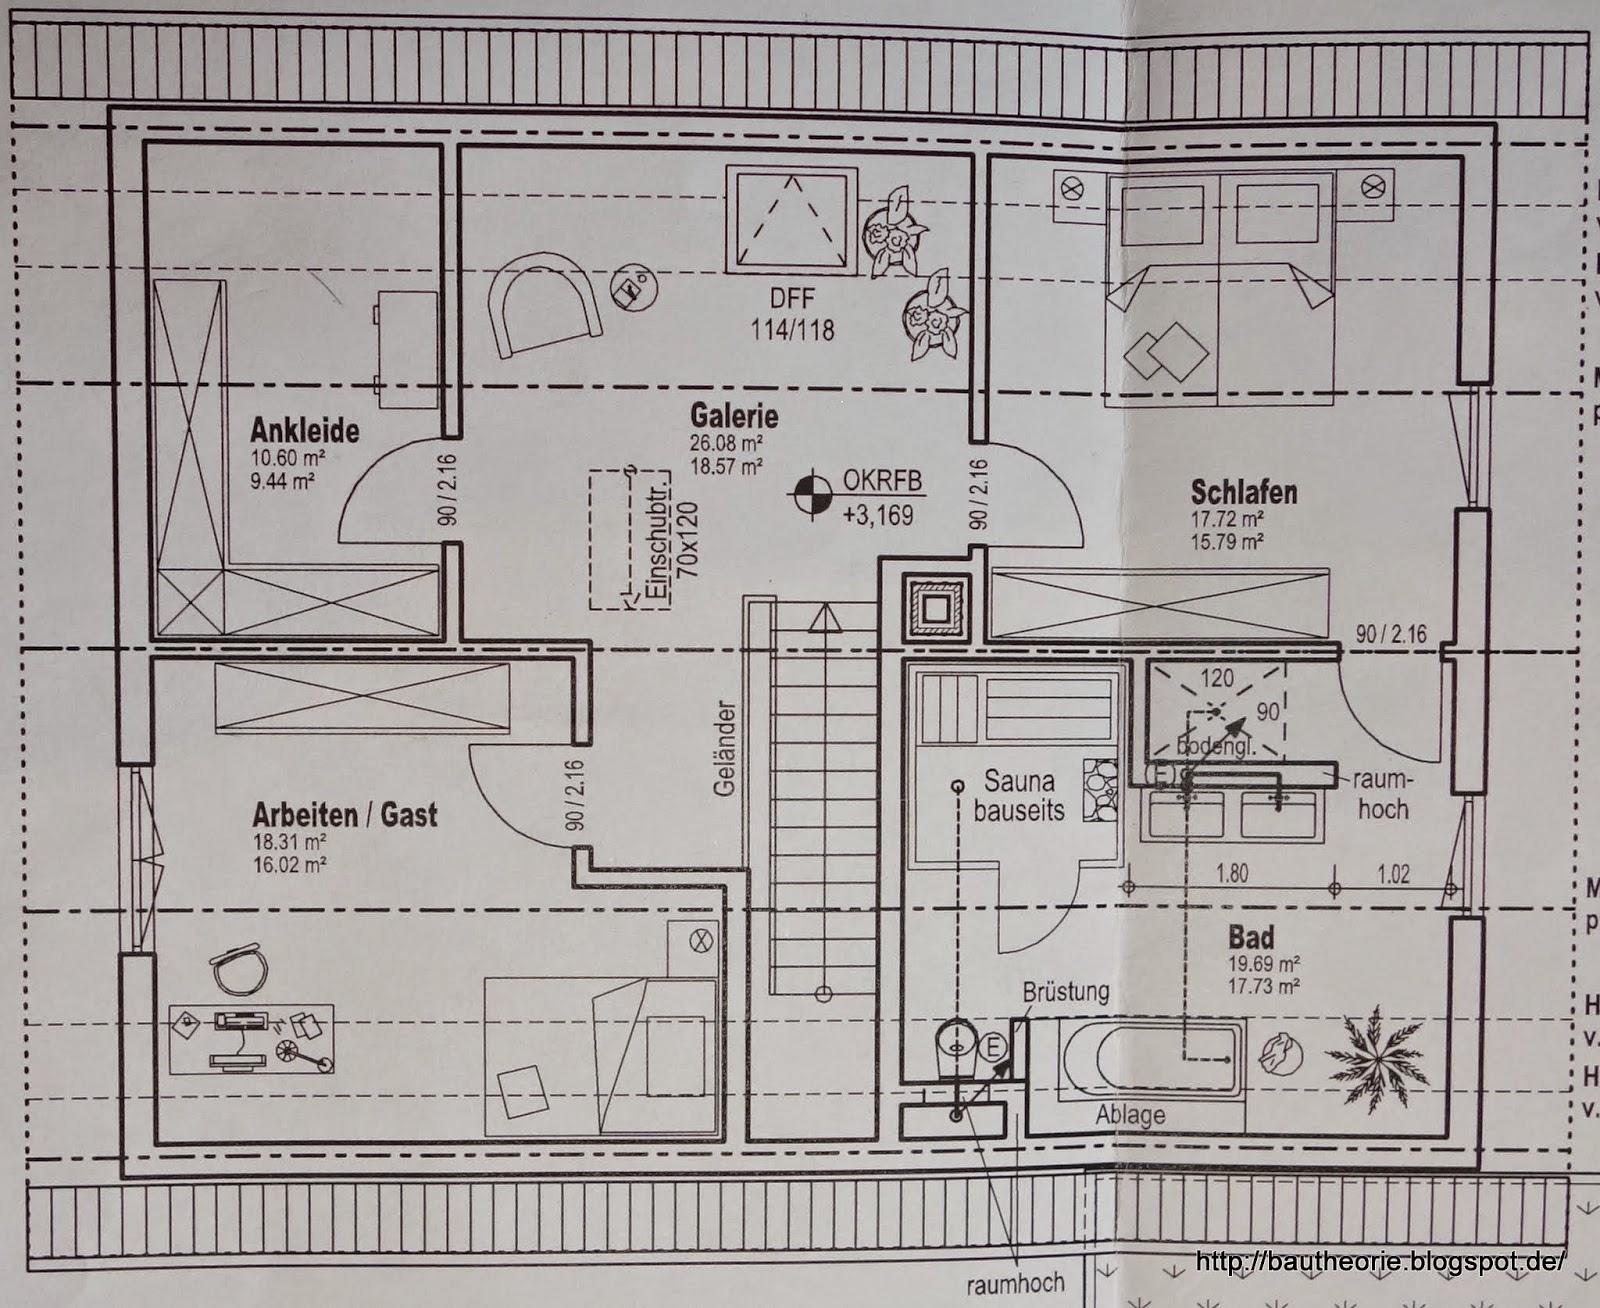 1 qm treppe preis kenngott treppe 1 qm preis hauptdesign beautiful gelander design ideen. Black Bedroom Furniture Sets. Home Design Ideas